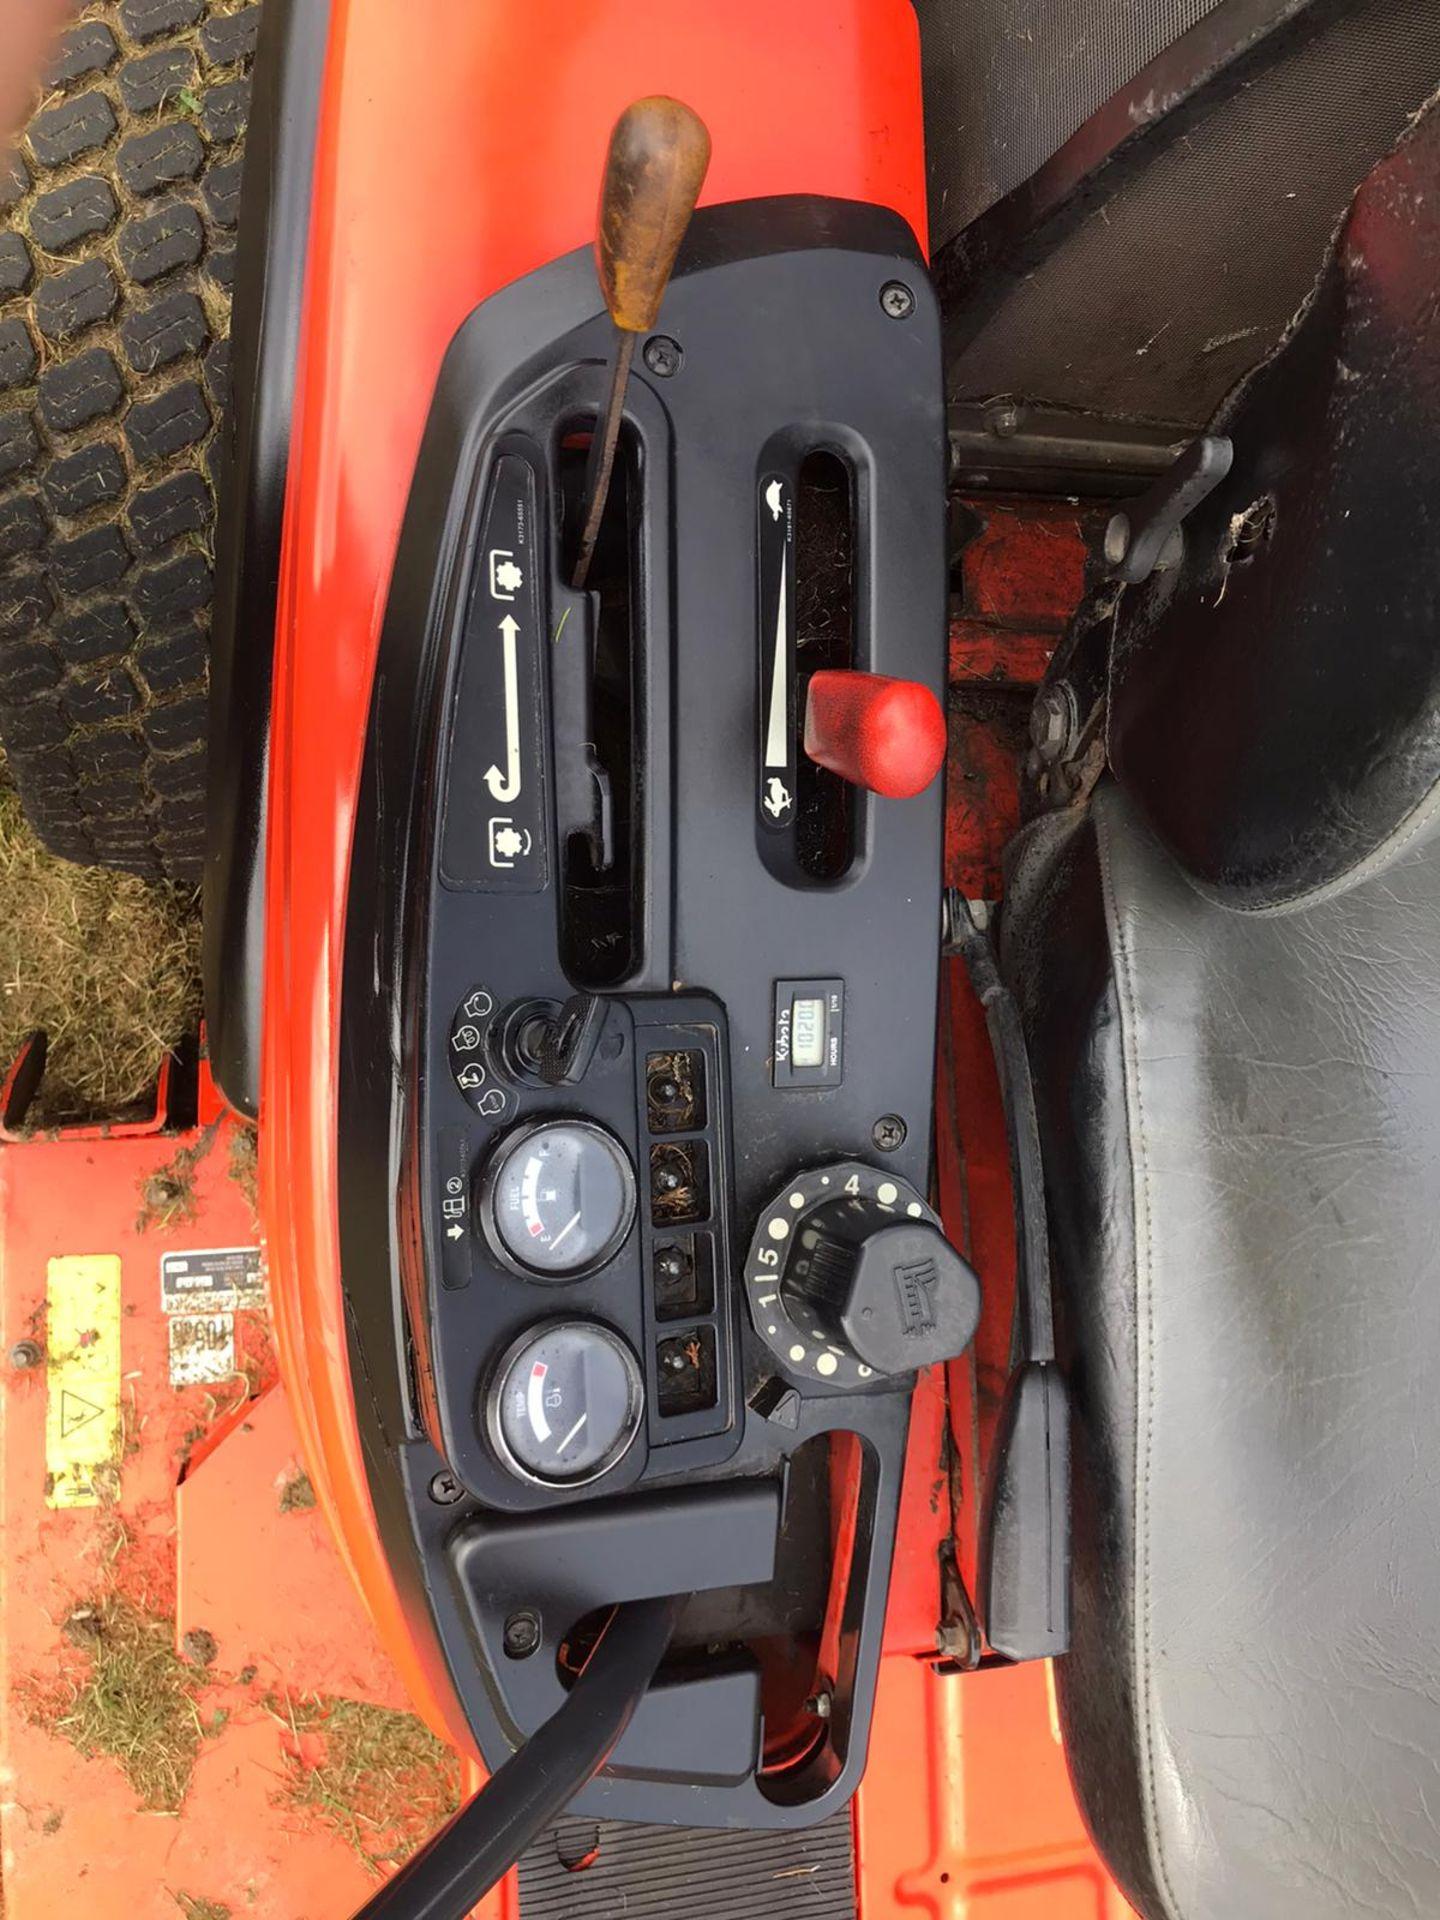 Lot 36 - 2013 KUBOTA ZD326 ZERO TURN RIDE ON LAWN MOWER, RUNS, DRIVES AND CUTS, 1020 HOURS *PLUS VAT*